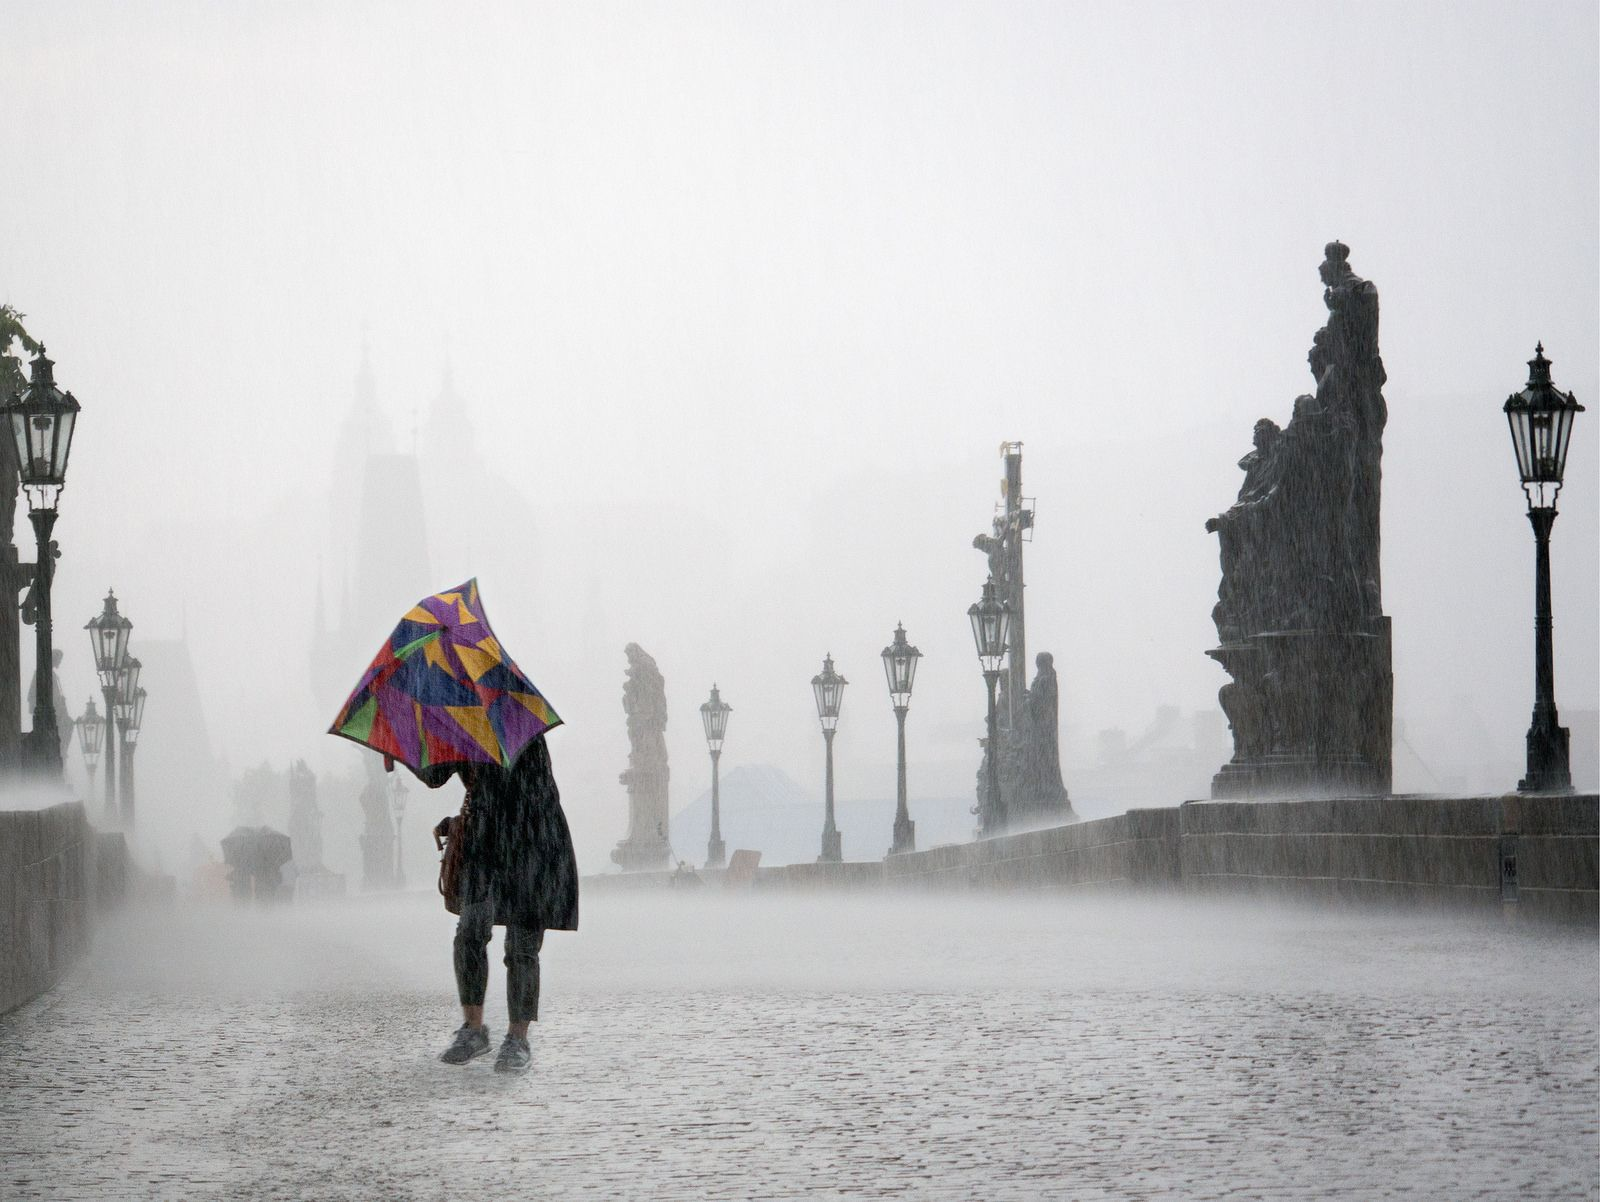 Under My Broken Umbrella